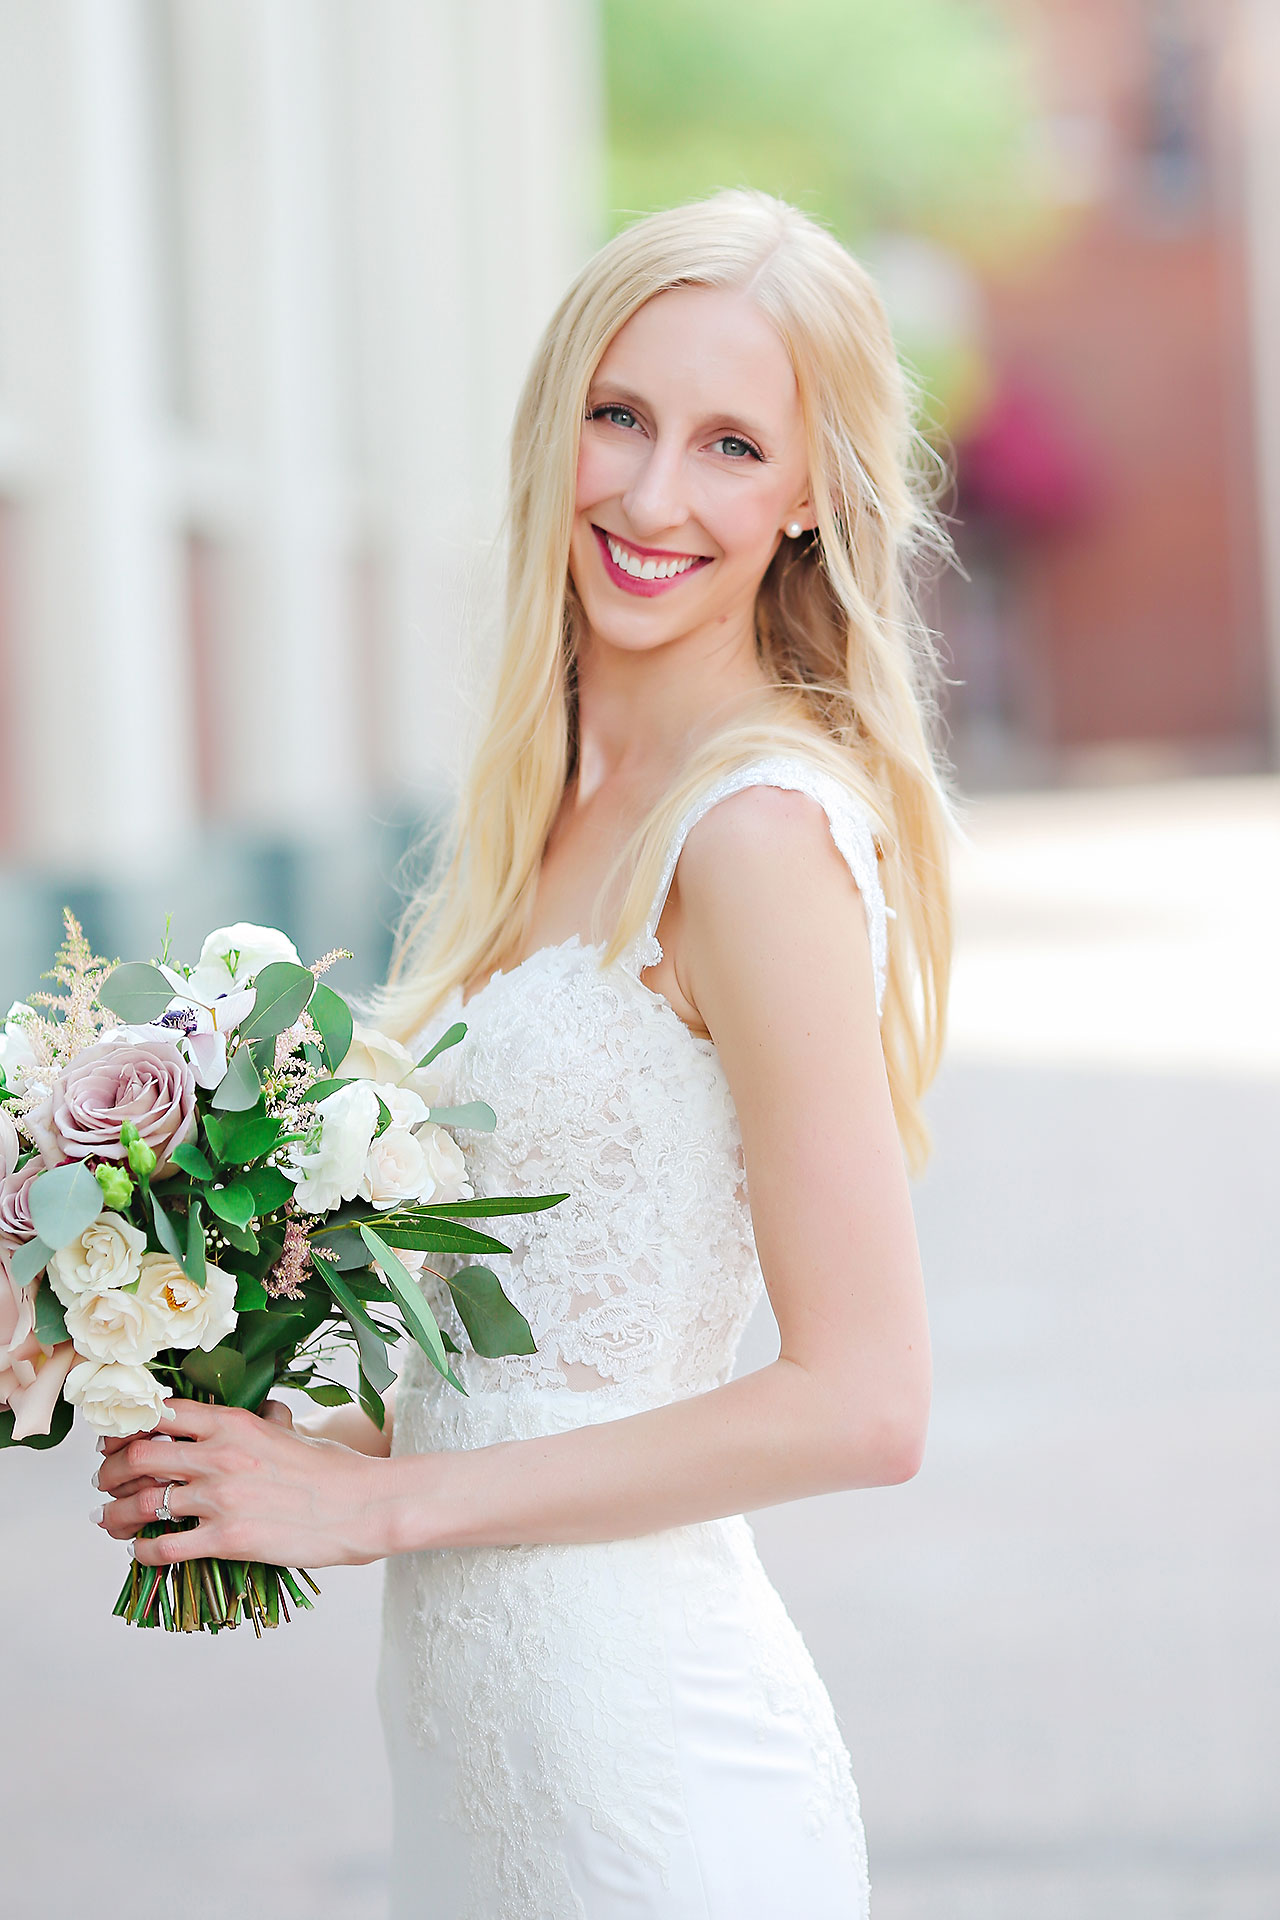 Molly Declan Scottish Rite Indianapolis Wedding 109